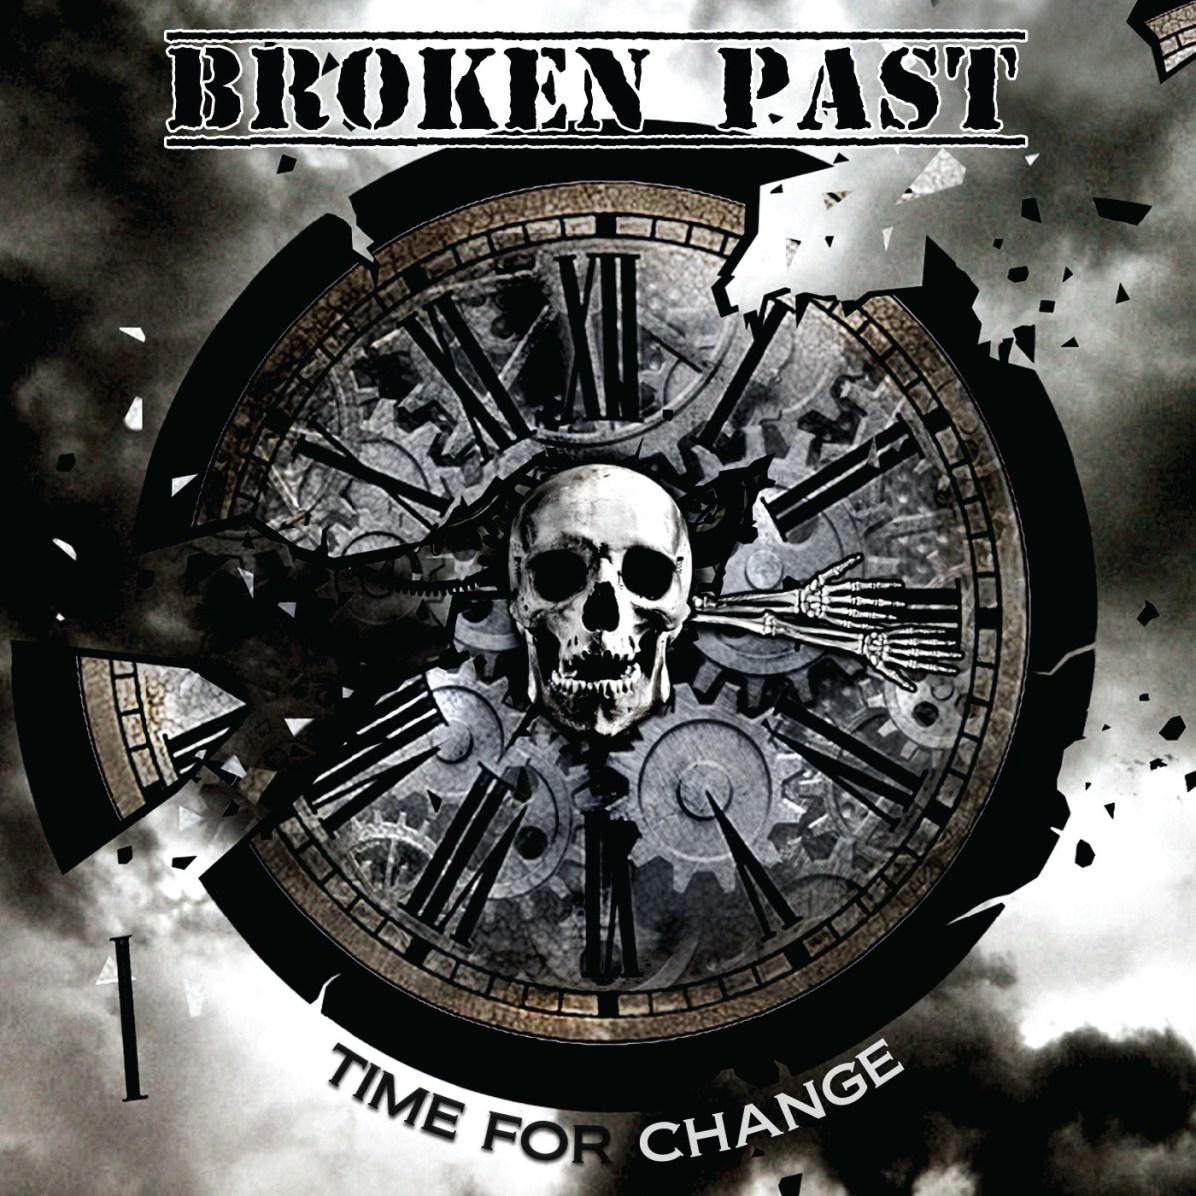 Broken Past - Time For Change